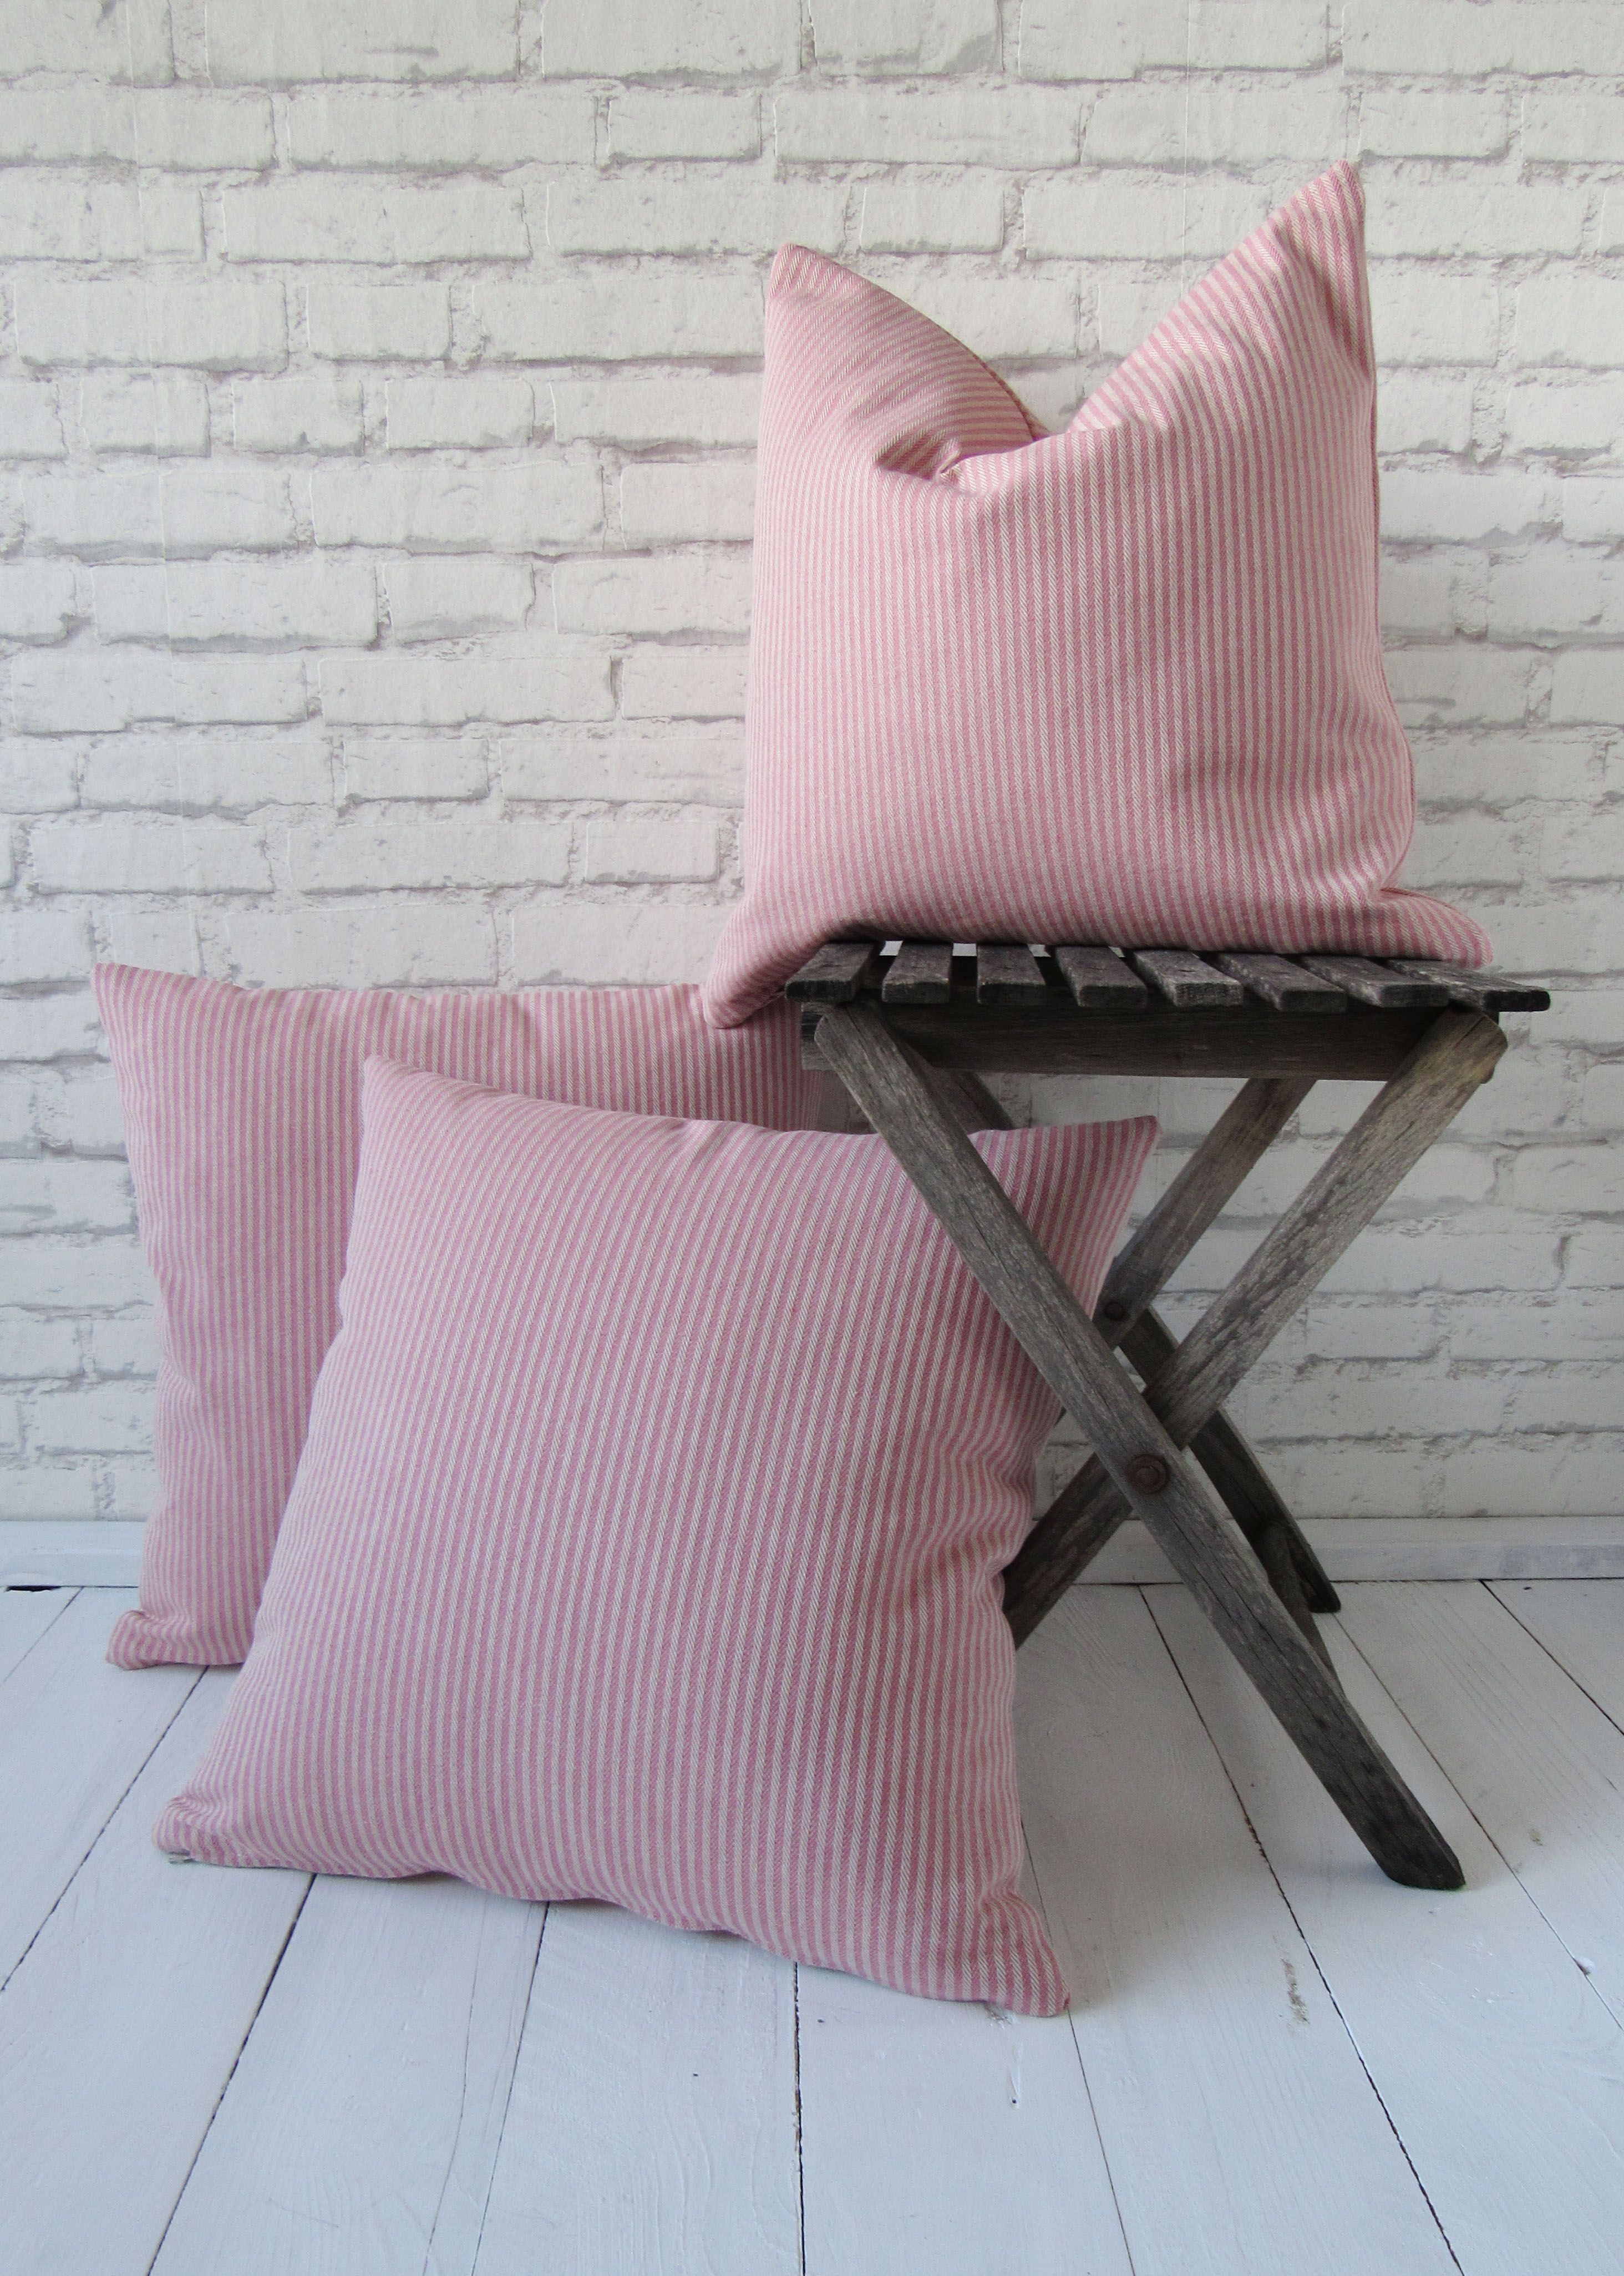 Herringbone Pillow Case 16x16 Inch Blush Pink Rustic